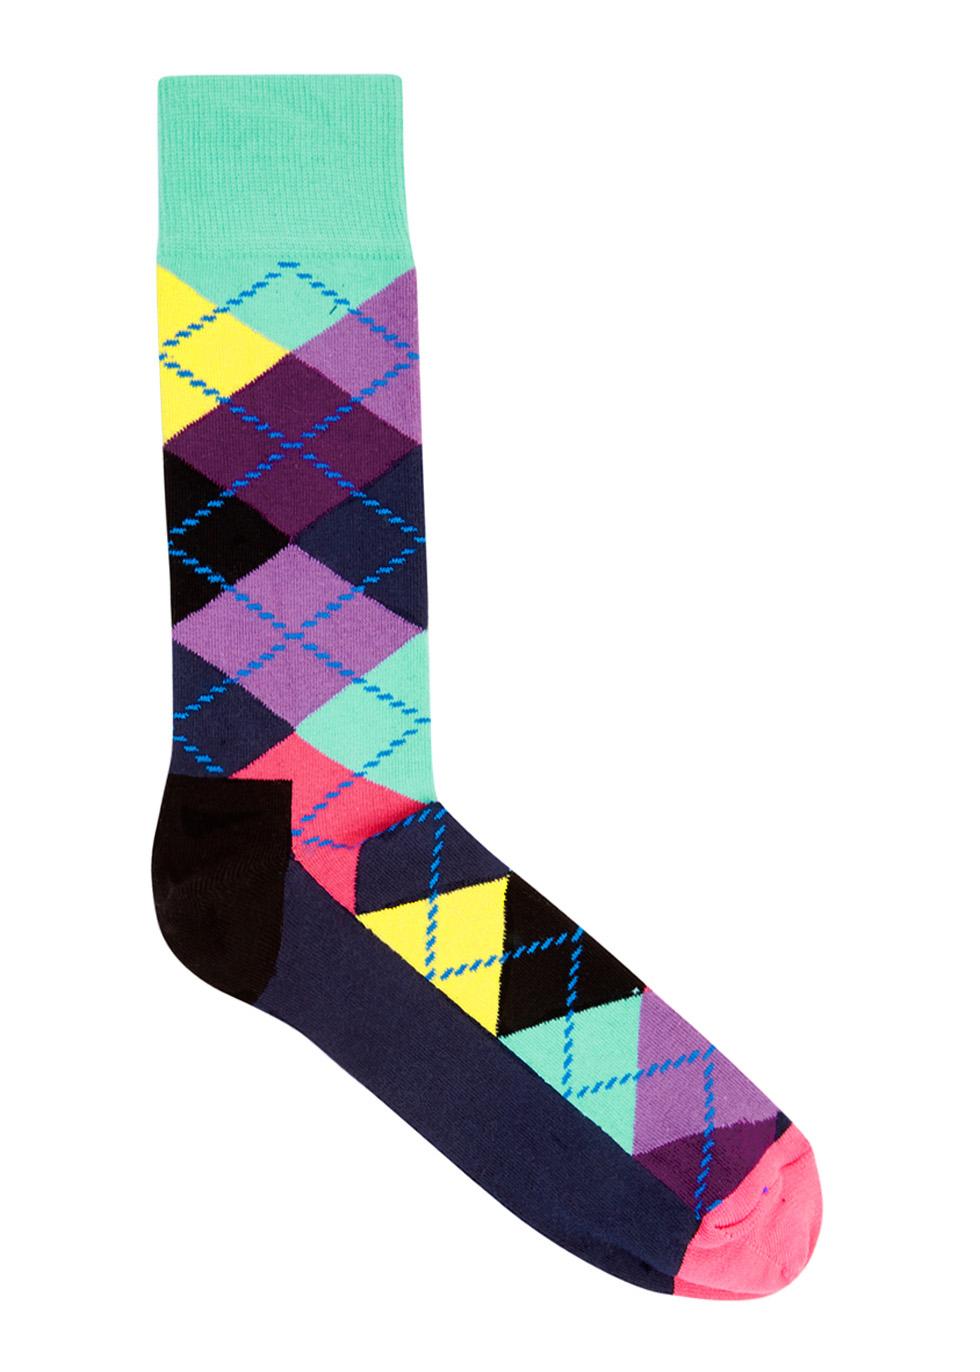 Argyle cotton blend socks - Happy Socks